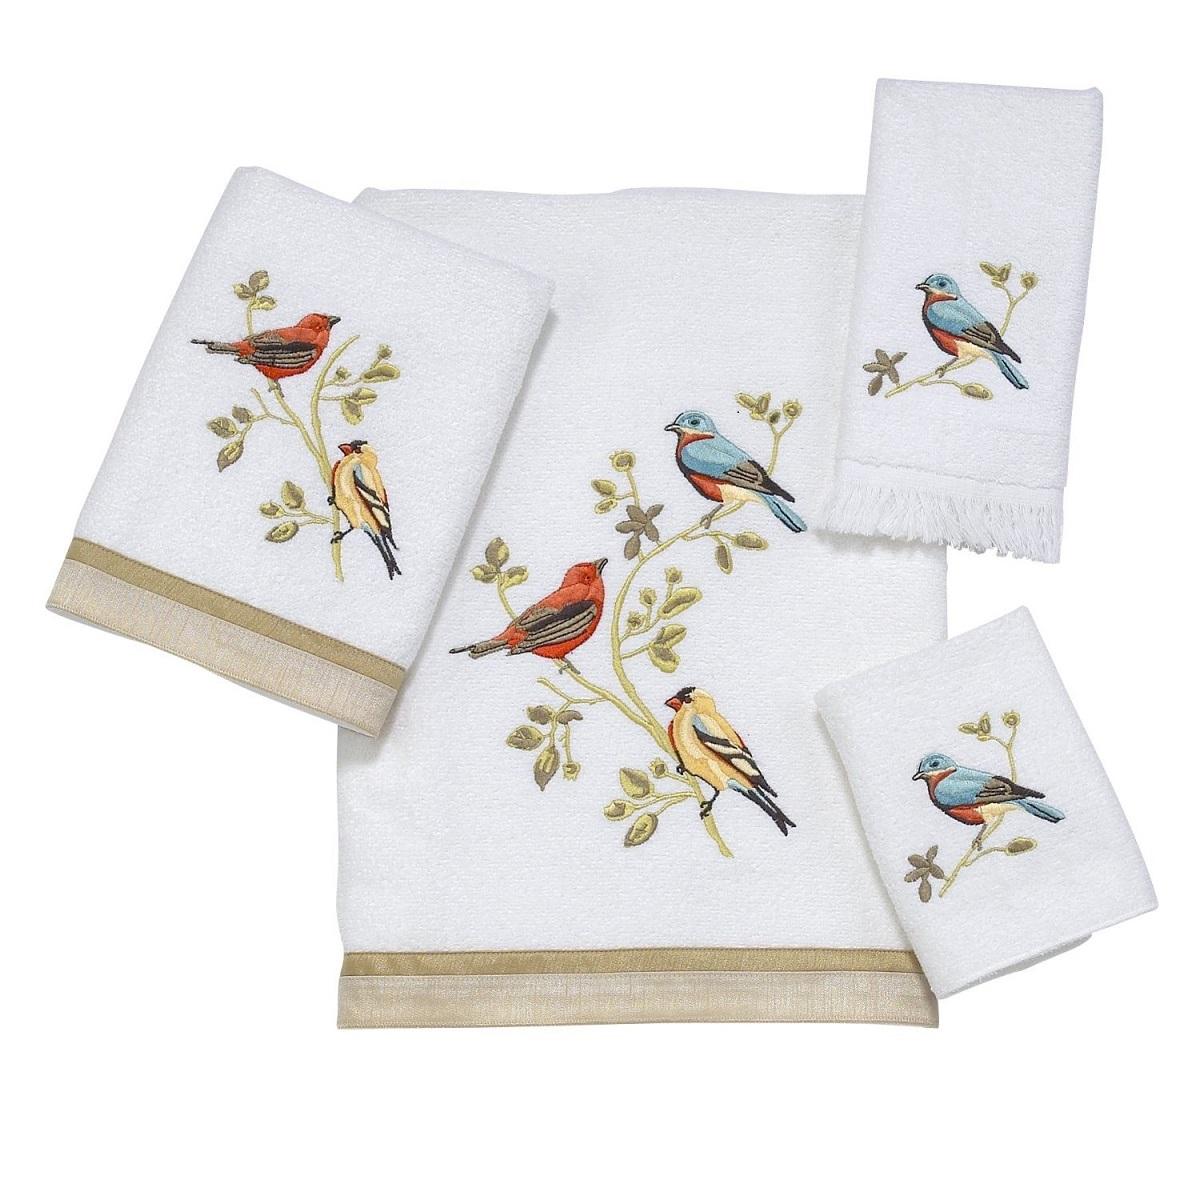 Полотенца Полотенце 41х76 Avanti Gilded Birds белое elitnoe-polotentse-mahrovoe-gilded-birds-beloe-ot-avanti-kanada.jpg